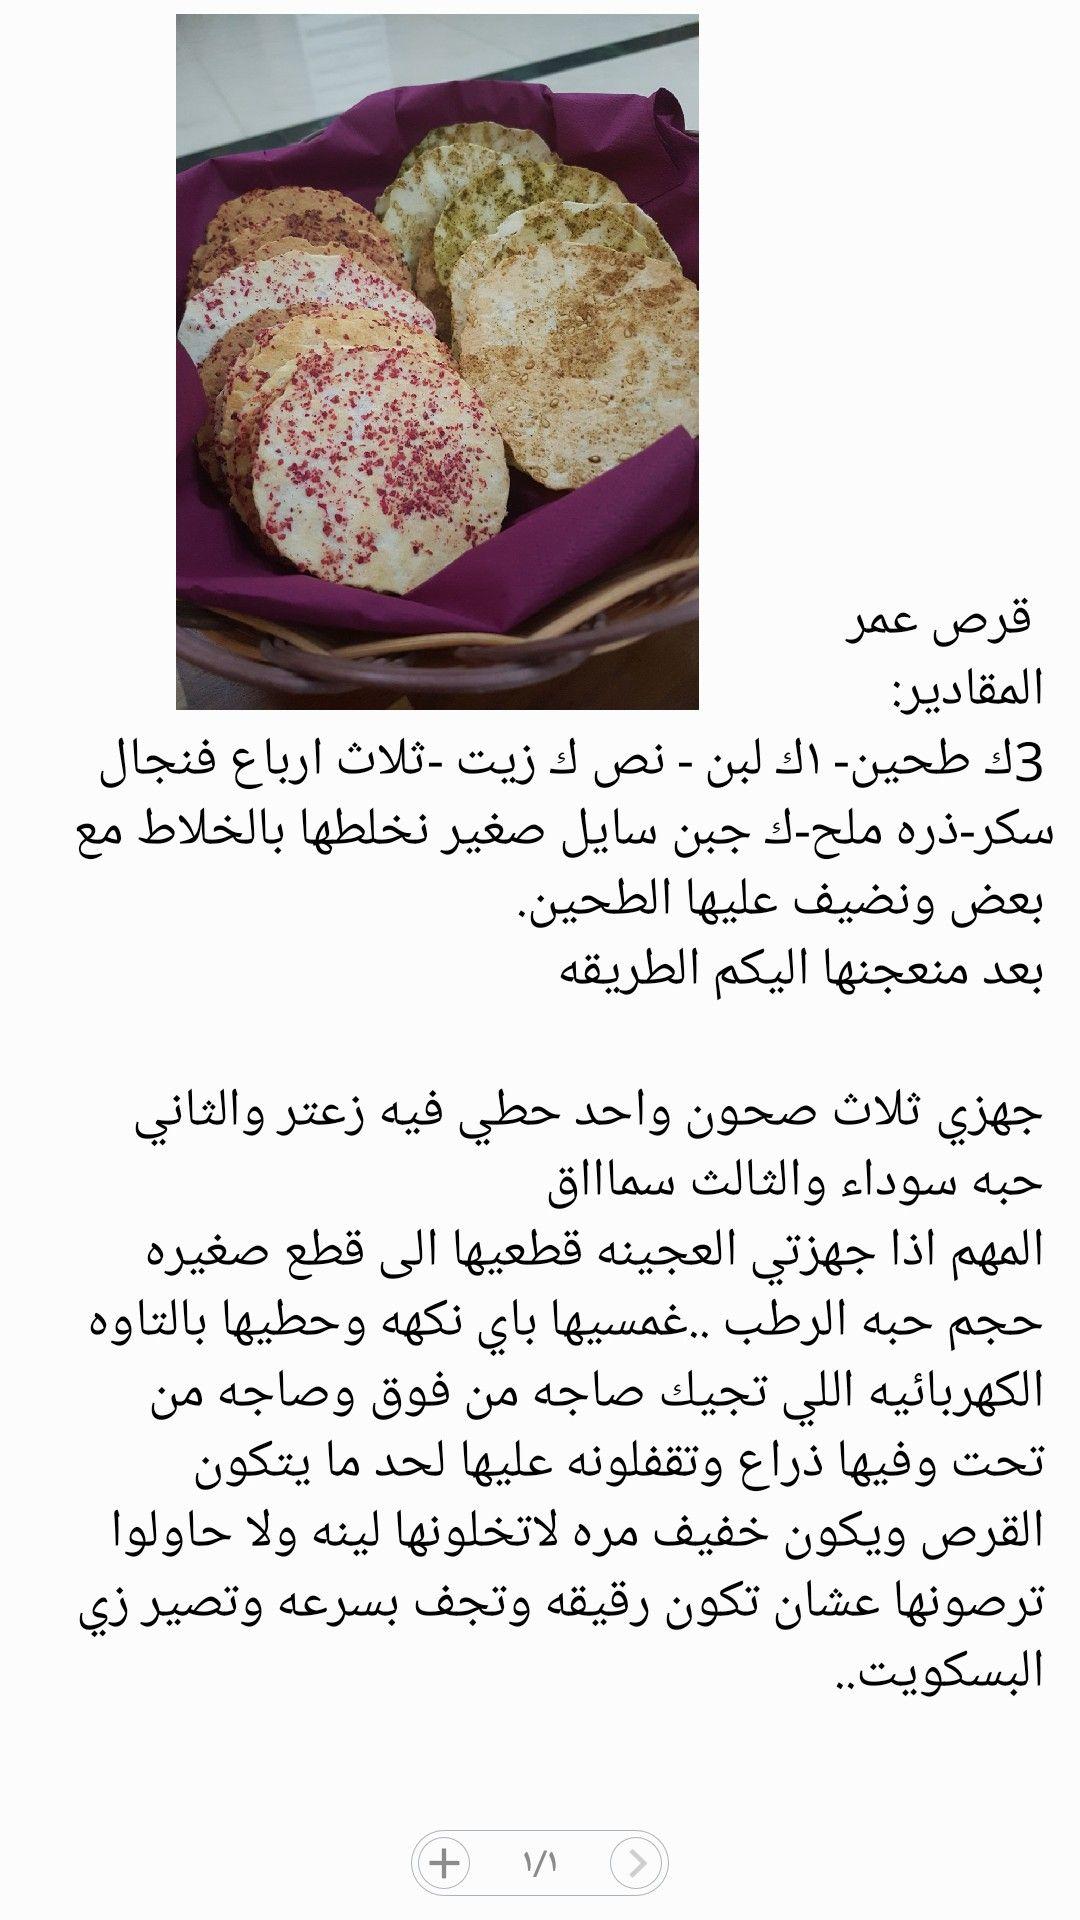 قرص عمر بالجبن Cooking Recipes Recipes Bread Baking